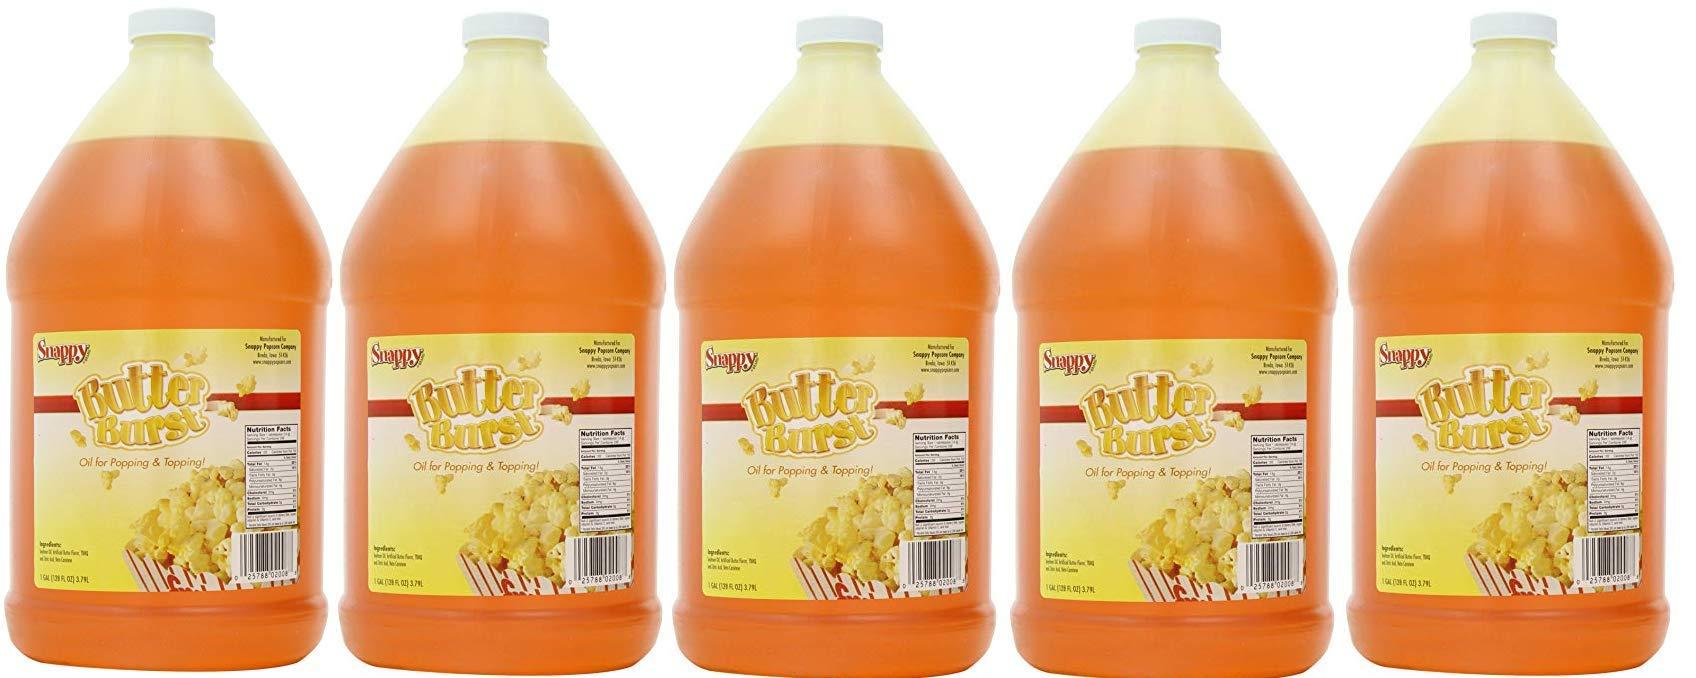 Snappy Popcorn Butter Burst Oil, 1 gallon(128 fl oz) (5(Pack))